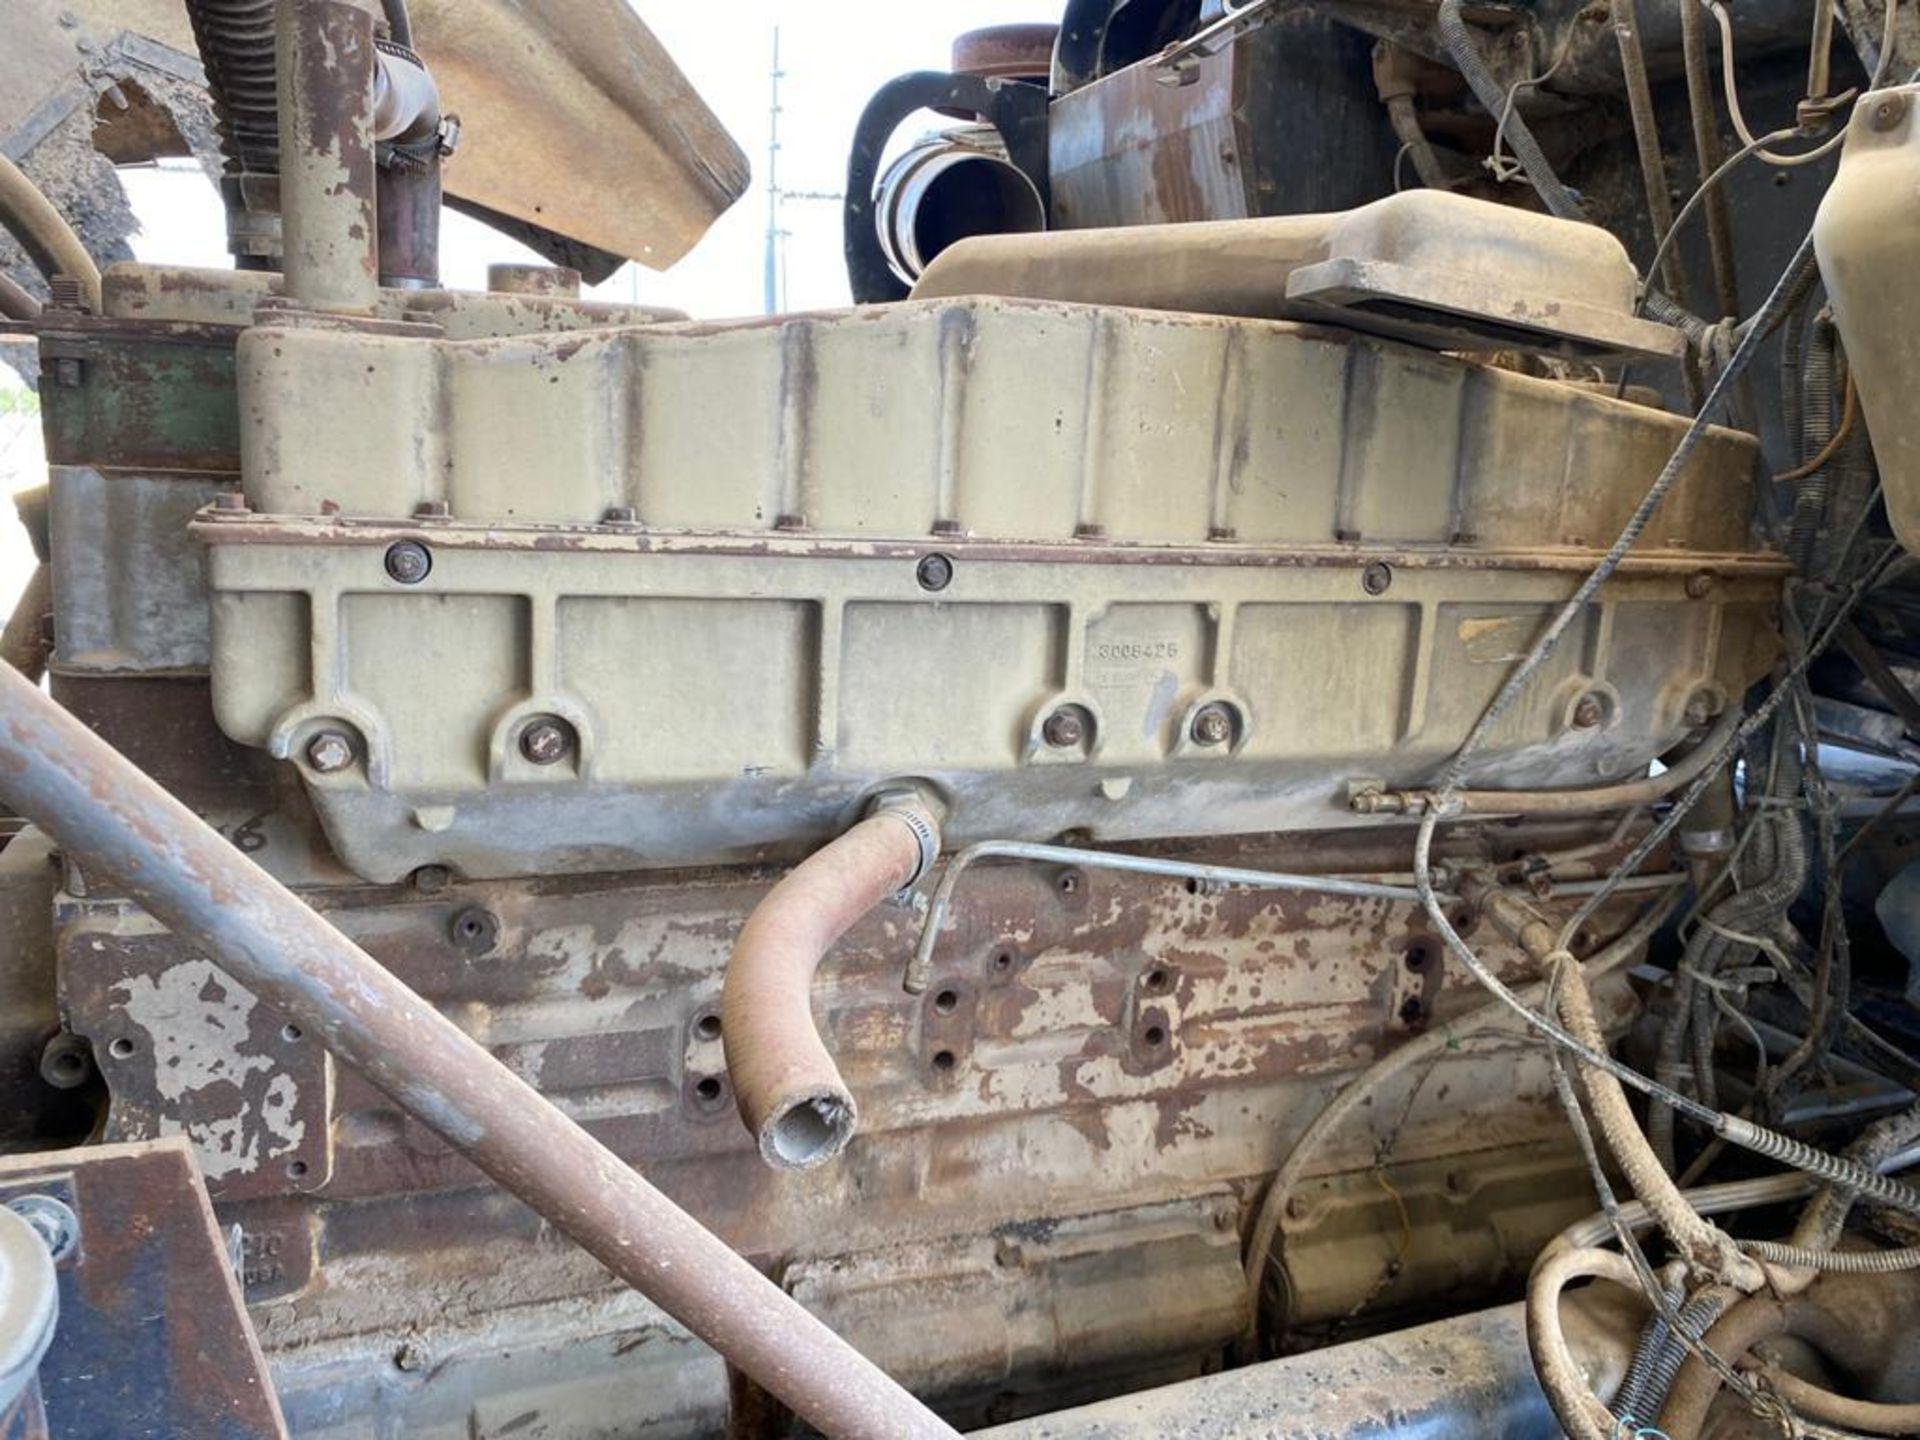 1983 Kenworth Dump Truck, standard transmission of 10 speeds, with Cummins motor - Image 44 of 68